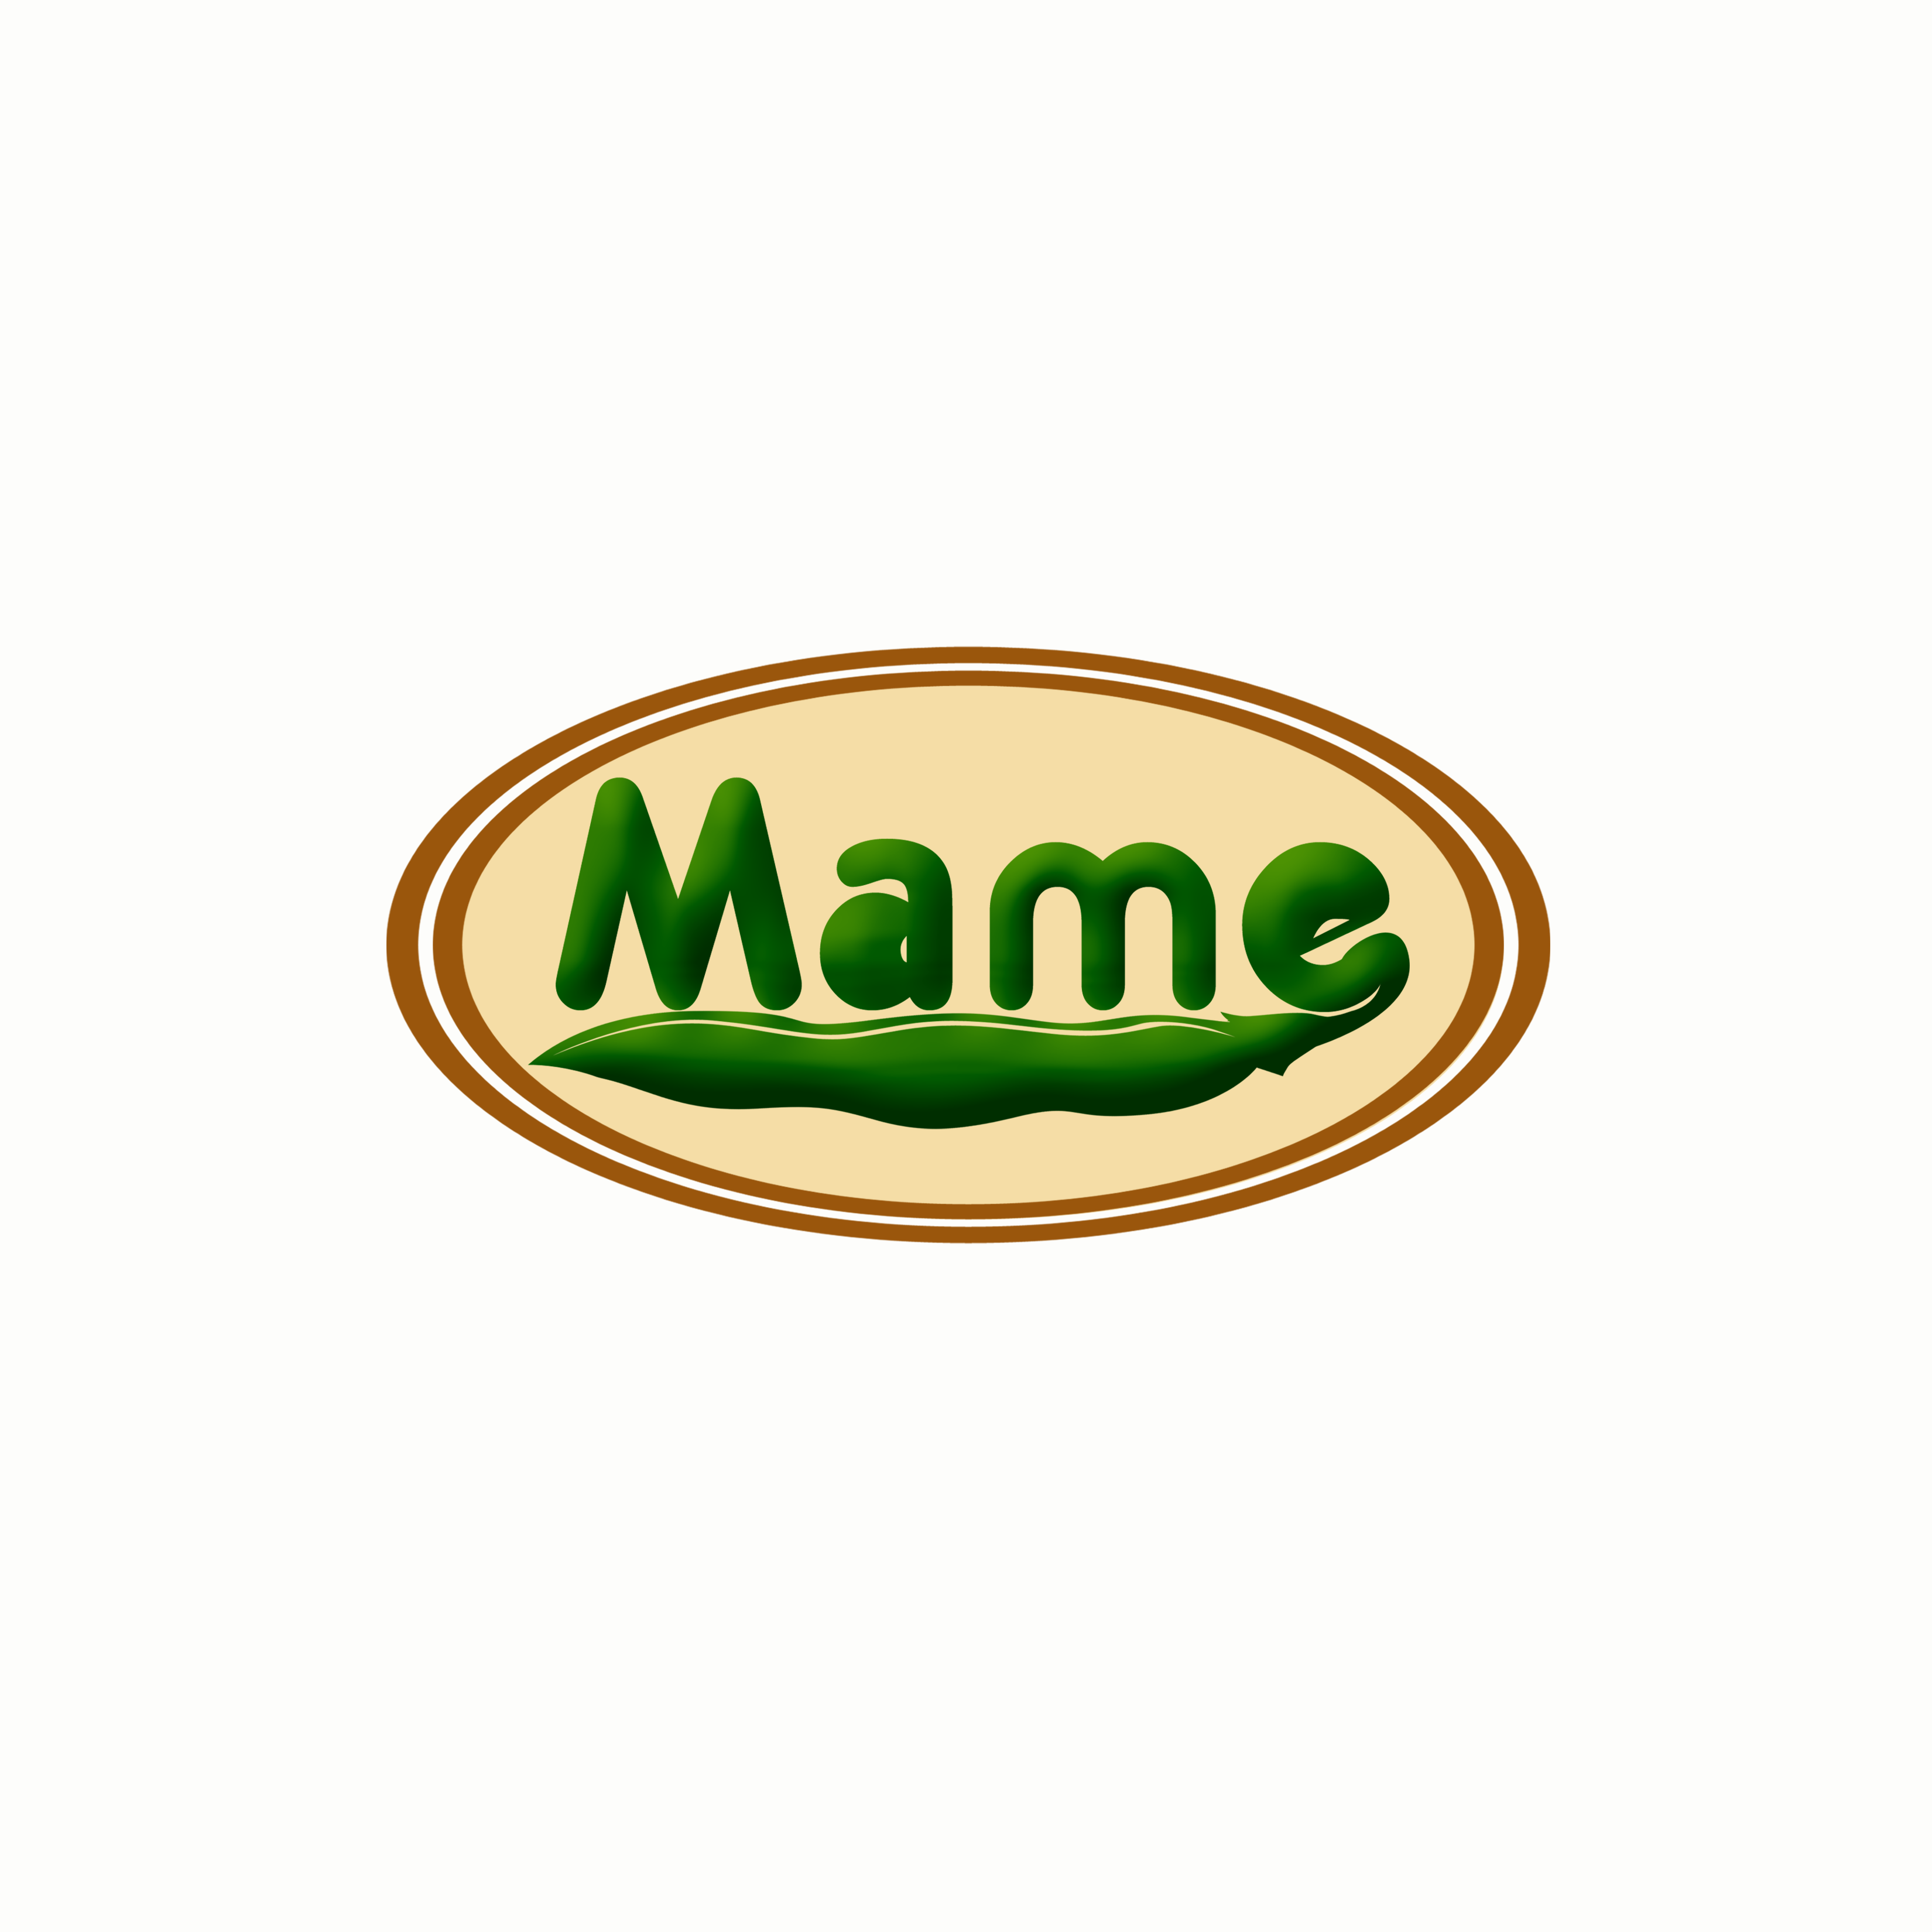 Logo Design by Allan Esclamado - Entry No. 13 in the Logo Design Contest Captivating Logo Design for Mame.